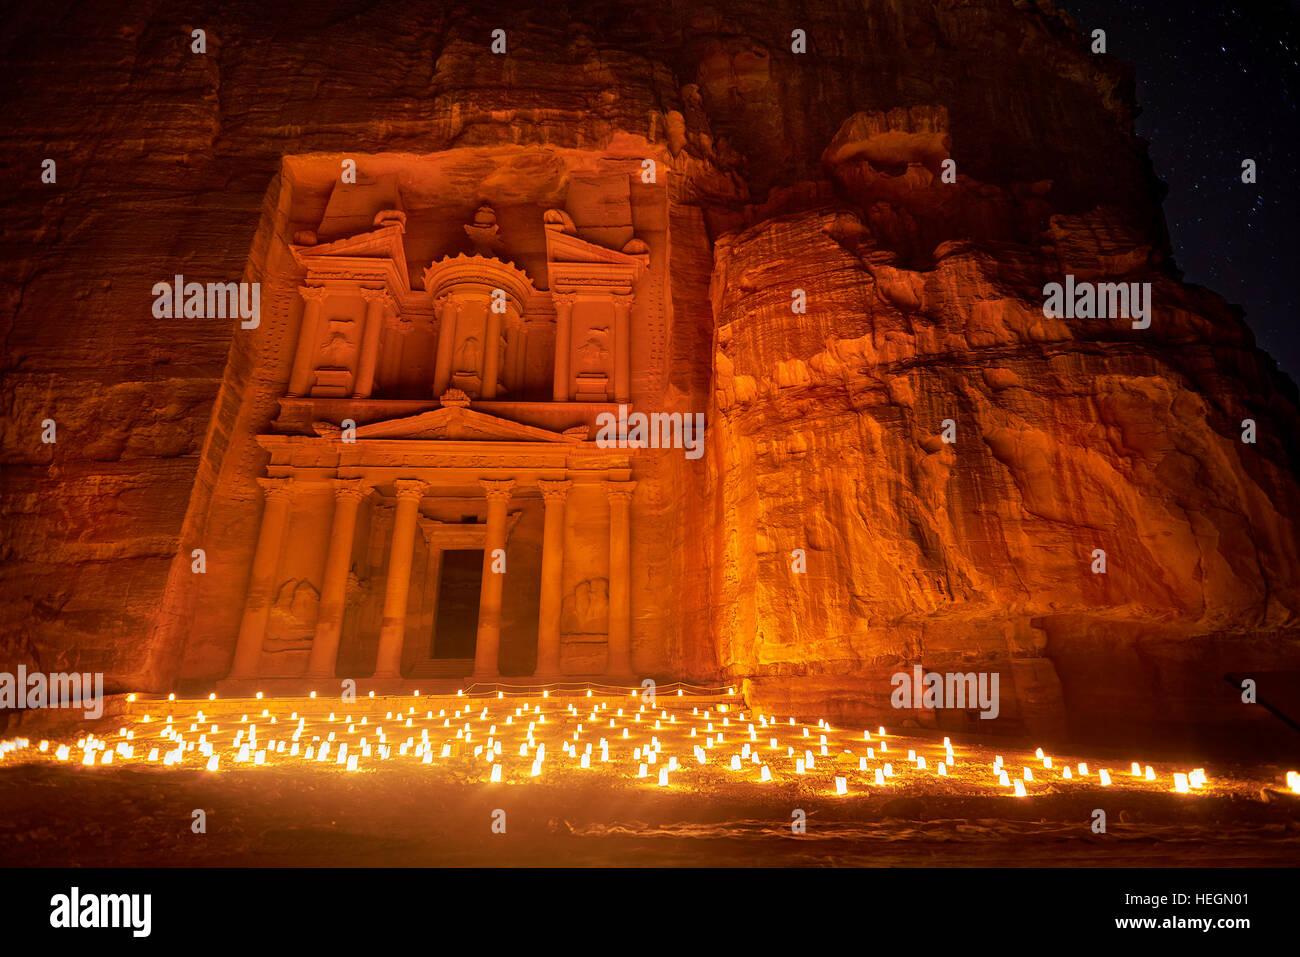 Al Khazneh - the treasury, ancient city of Petra by night, Jordan - Stock Image